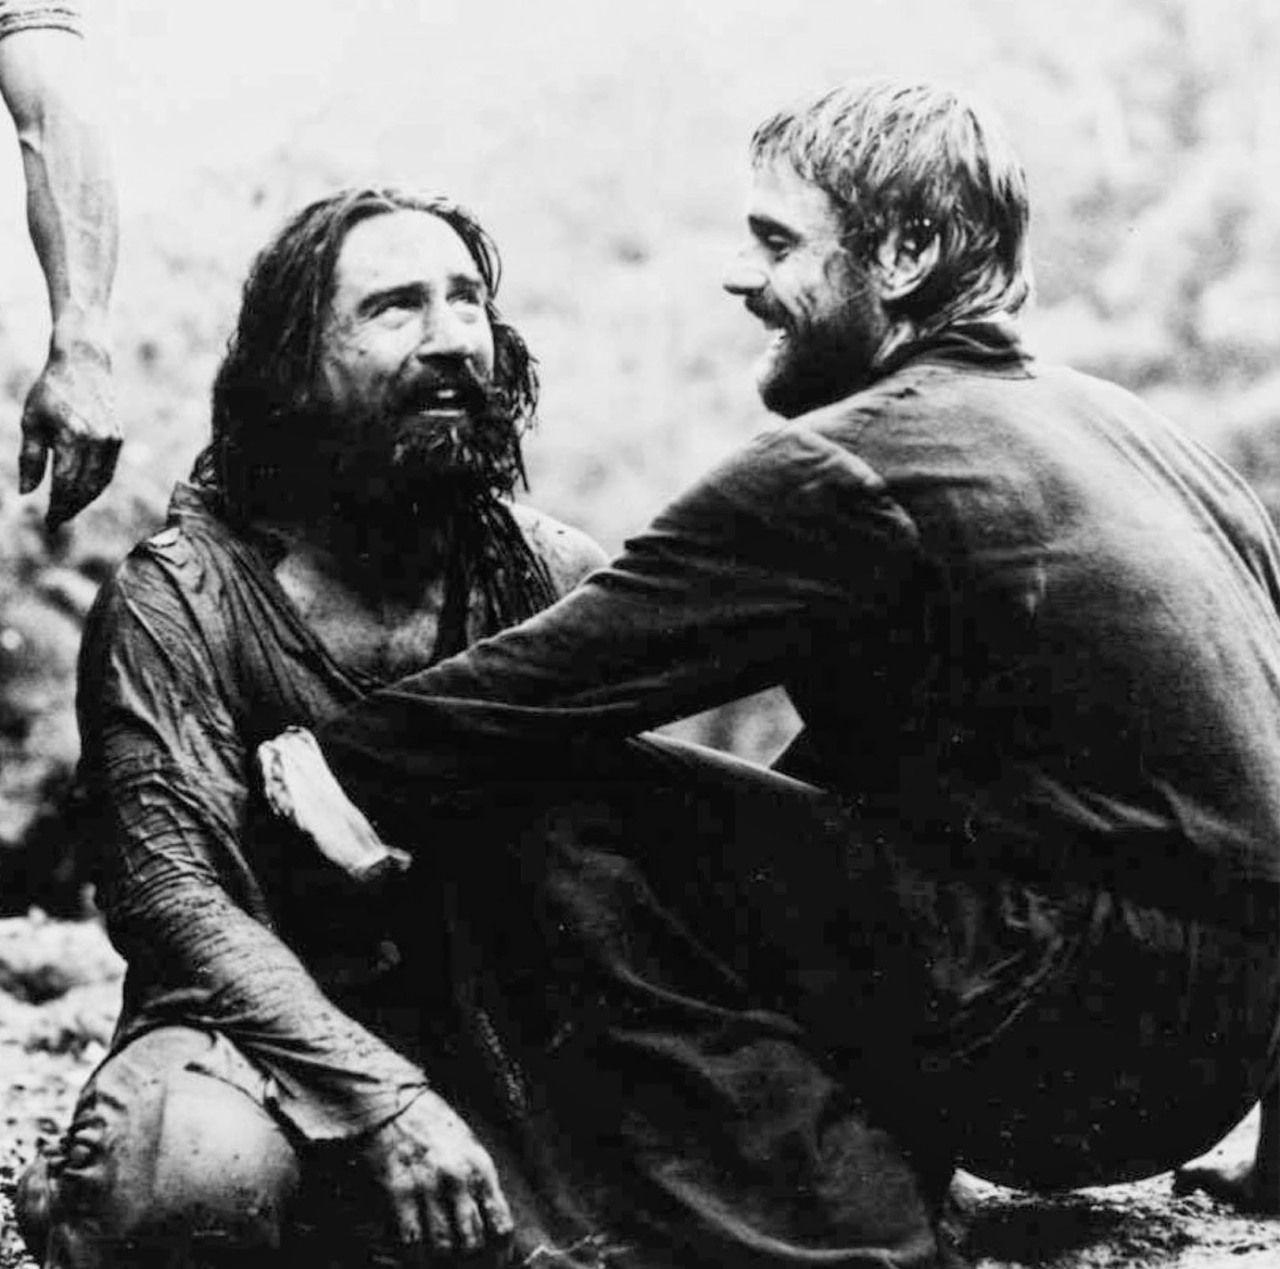 Robert De Niro Y Jeremy Irons En La Misión The Mission 1986 Jeremy Irons Good Movies Favorite Movies